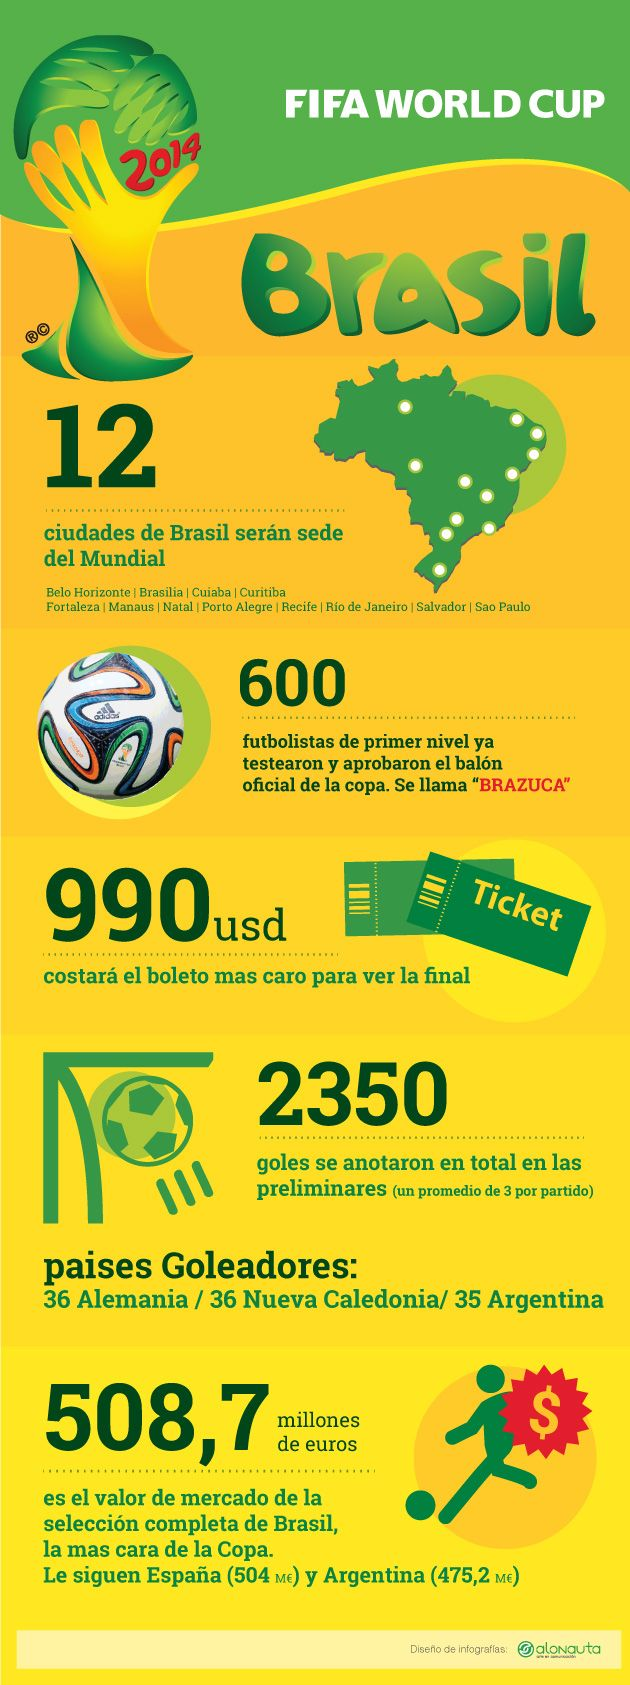 Mundial de football Brasil 2014 / FIFA World Cup